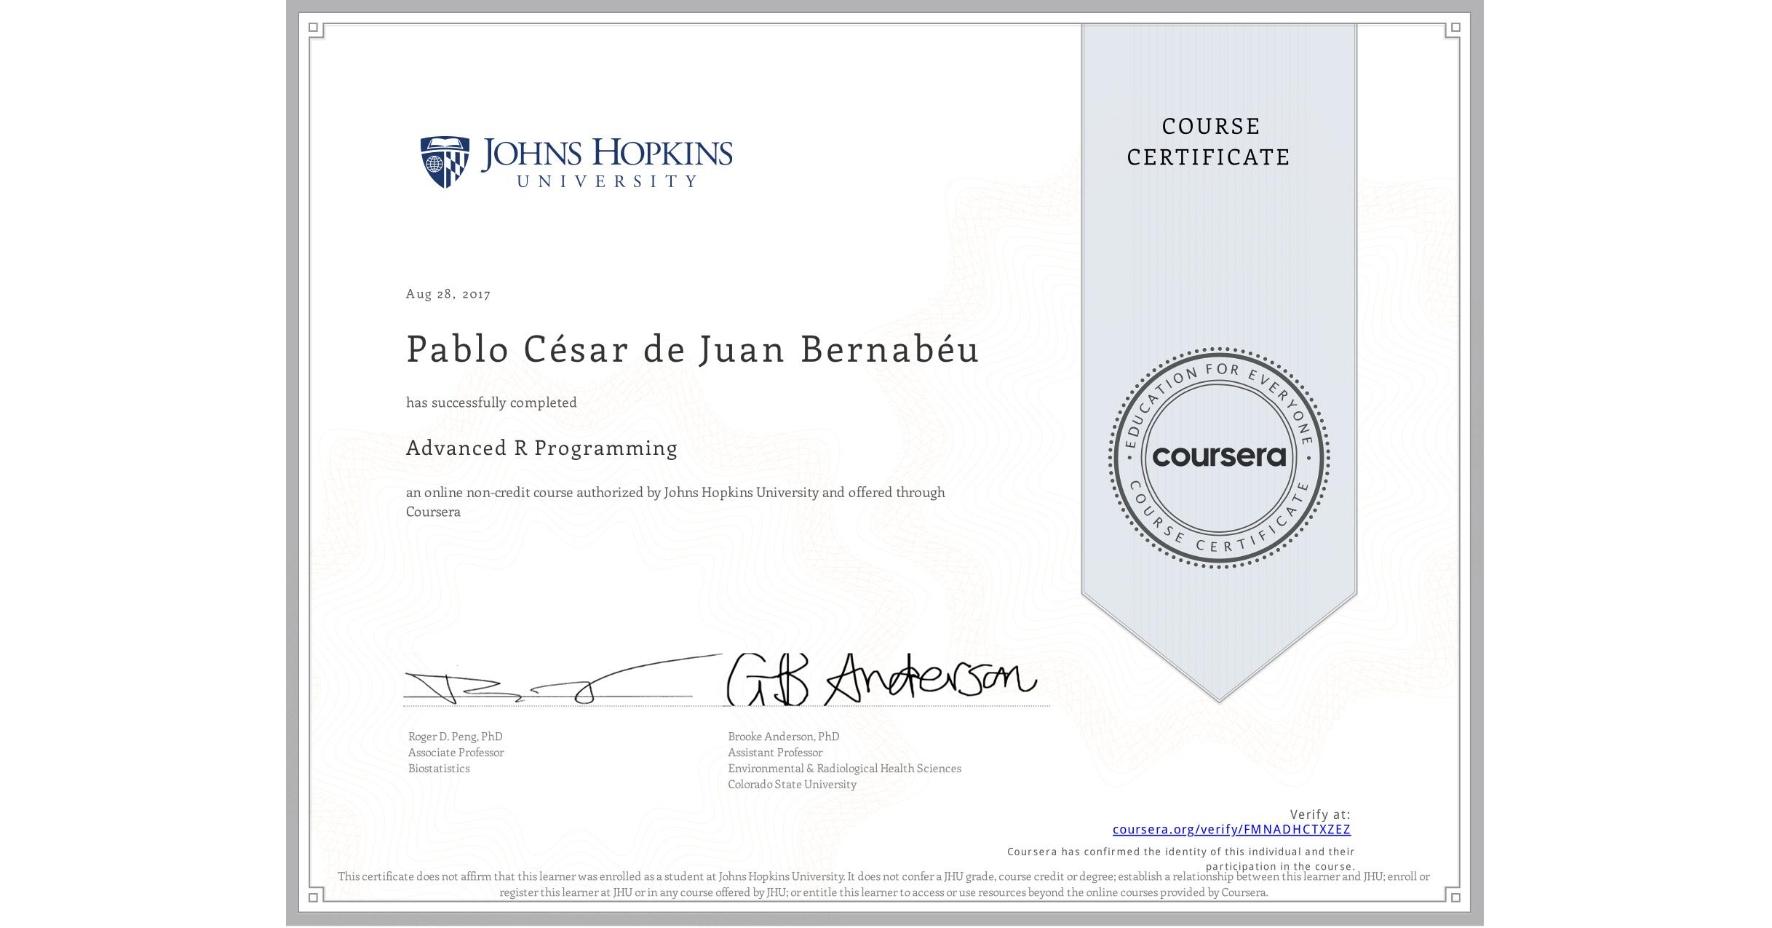 View certificate for Pablo César  de Juan Bernabéu, Advanced R Programming, an online non-credit course authorized by Johns Hopkins University and offered through Coursera